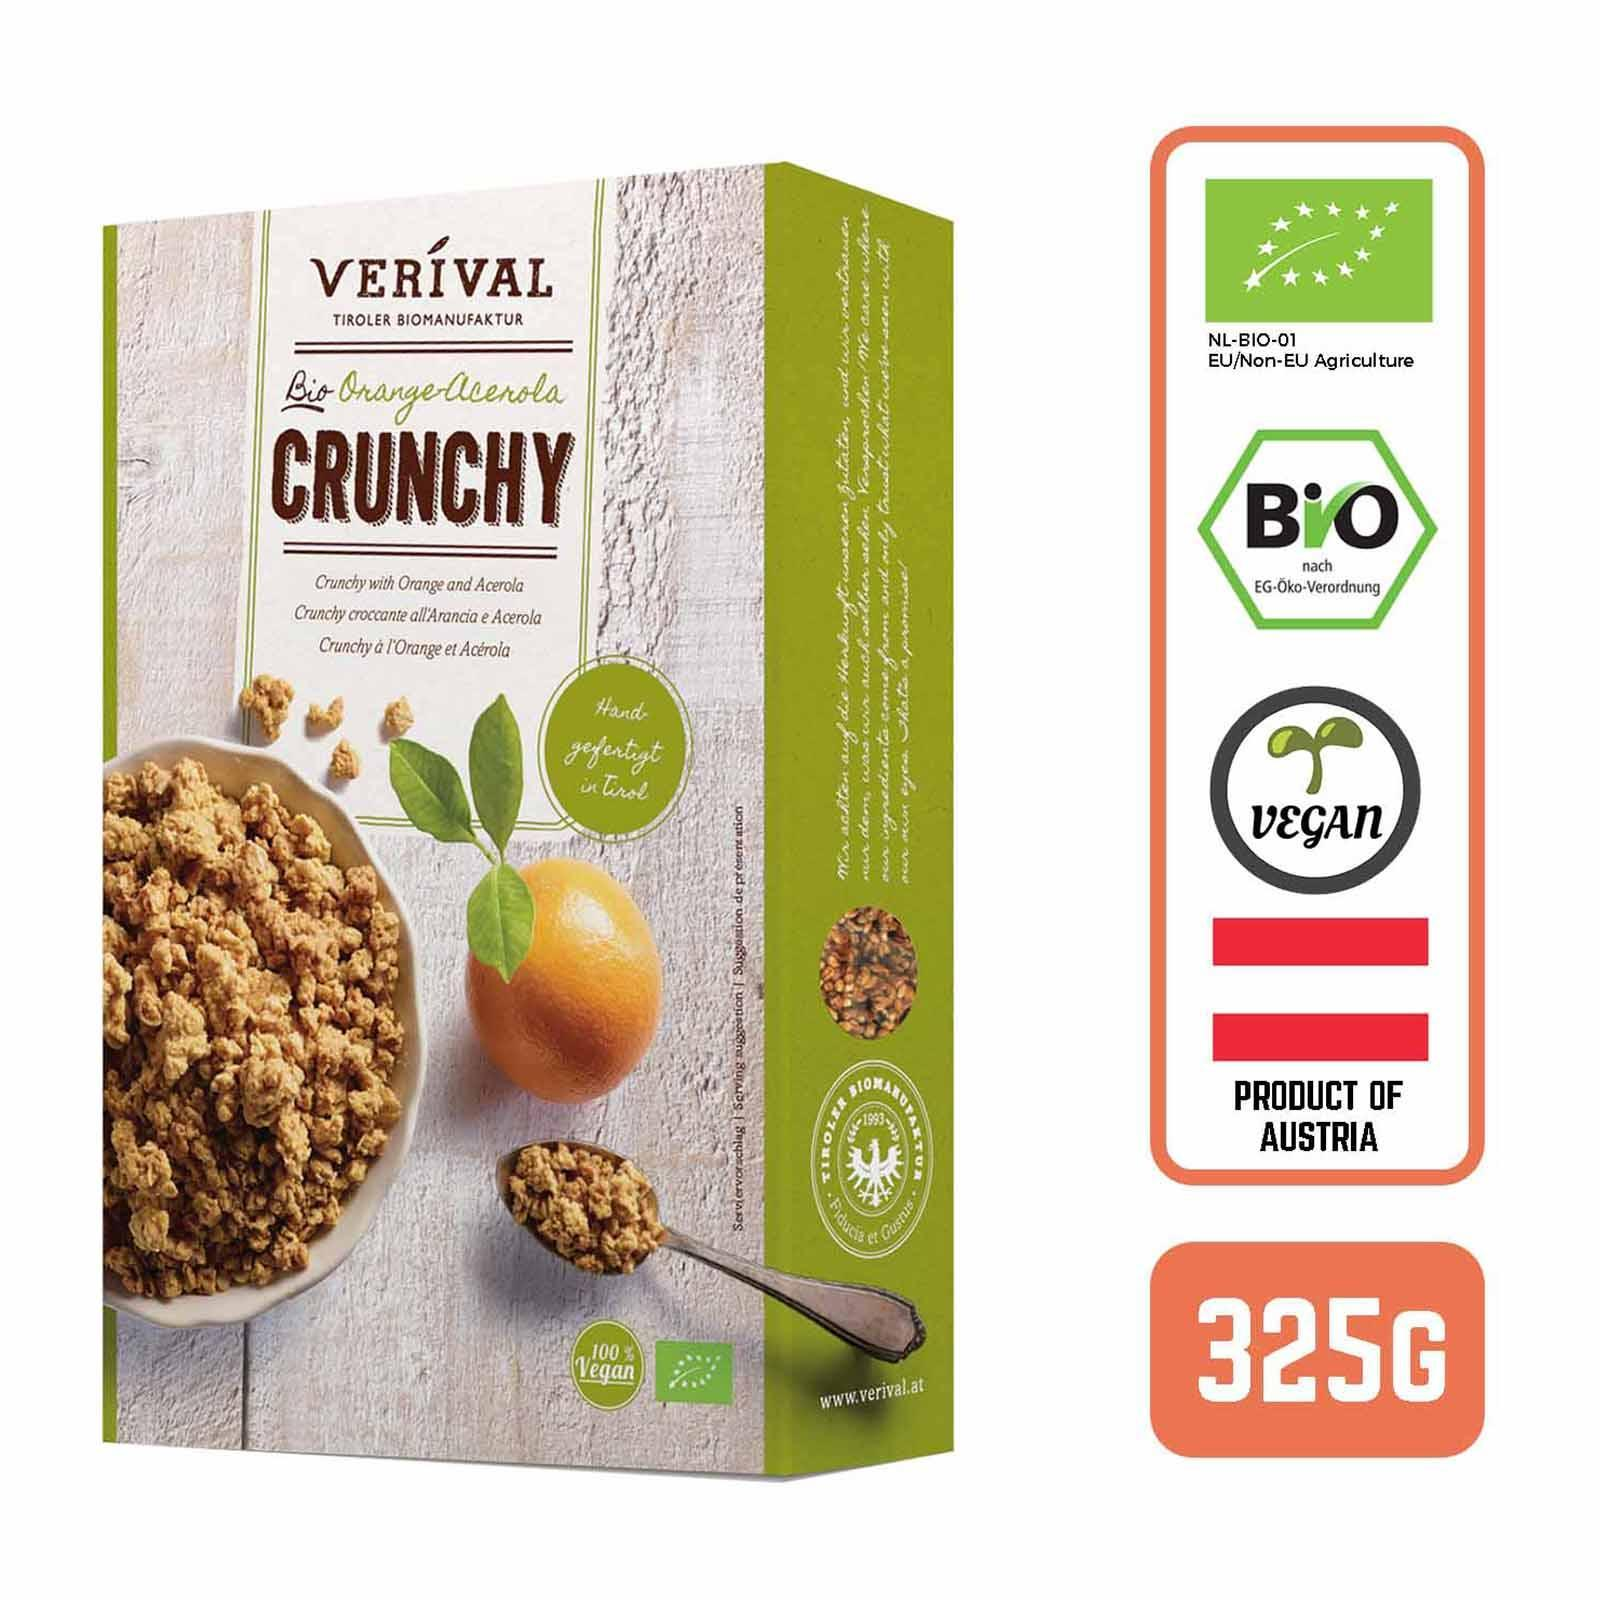 Verival Organic Austrian Crunchy Granola Muesli with Orange and Acerola